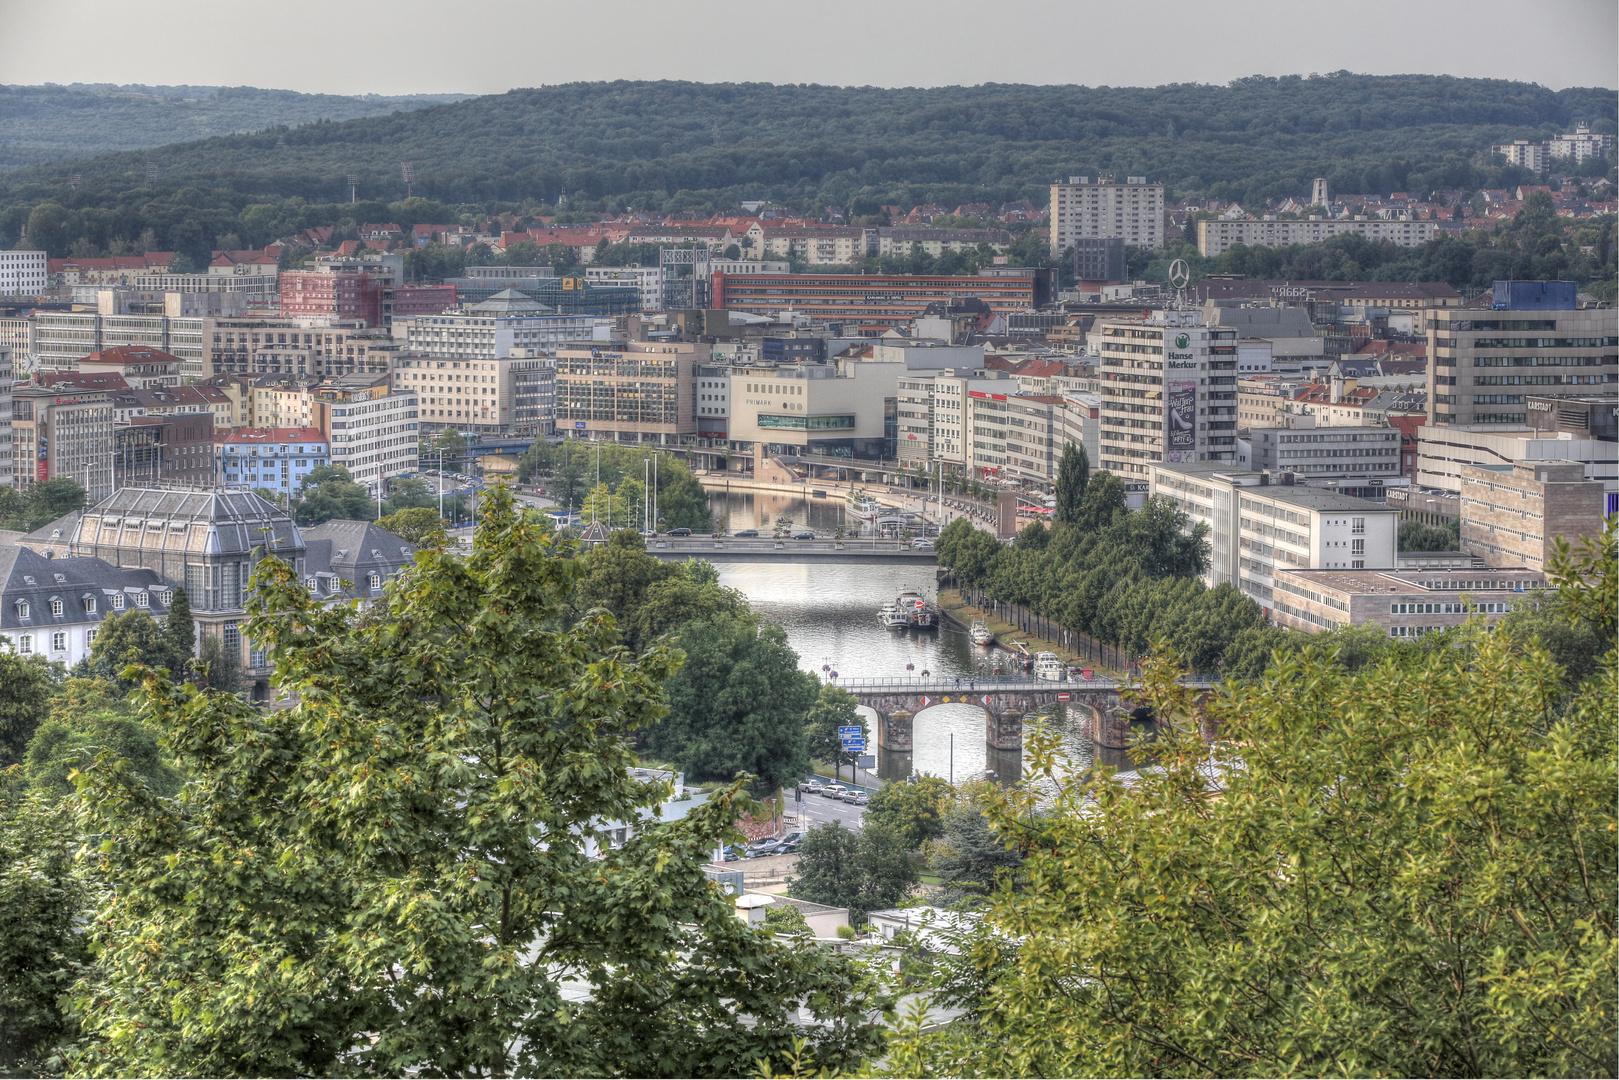 Stadtbild Saarbrücken